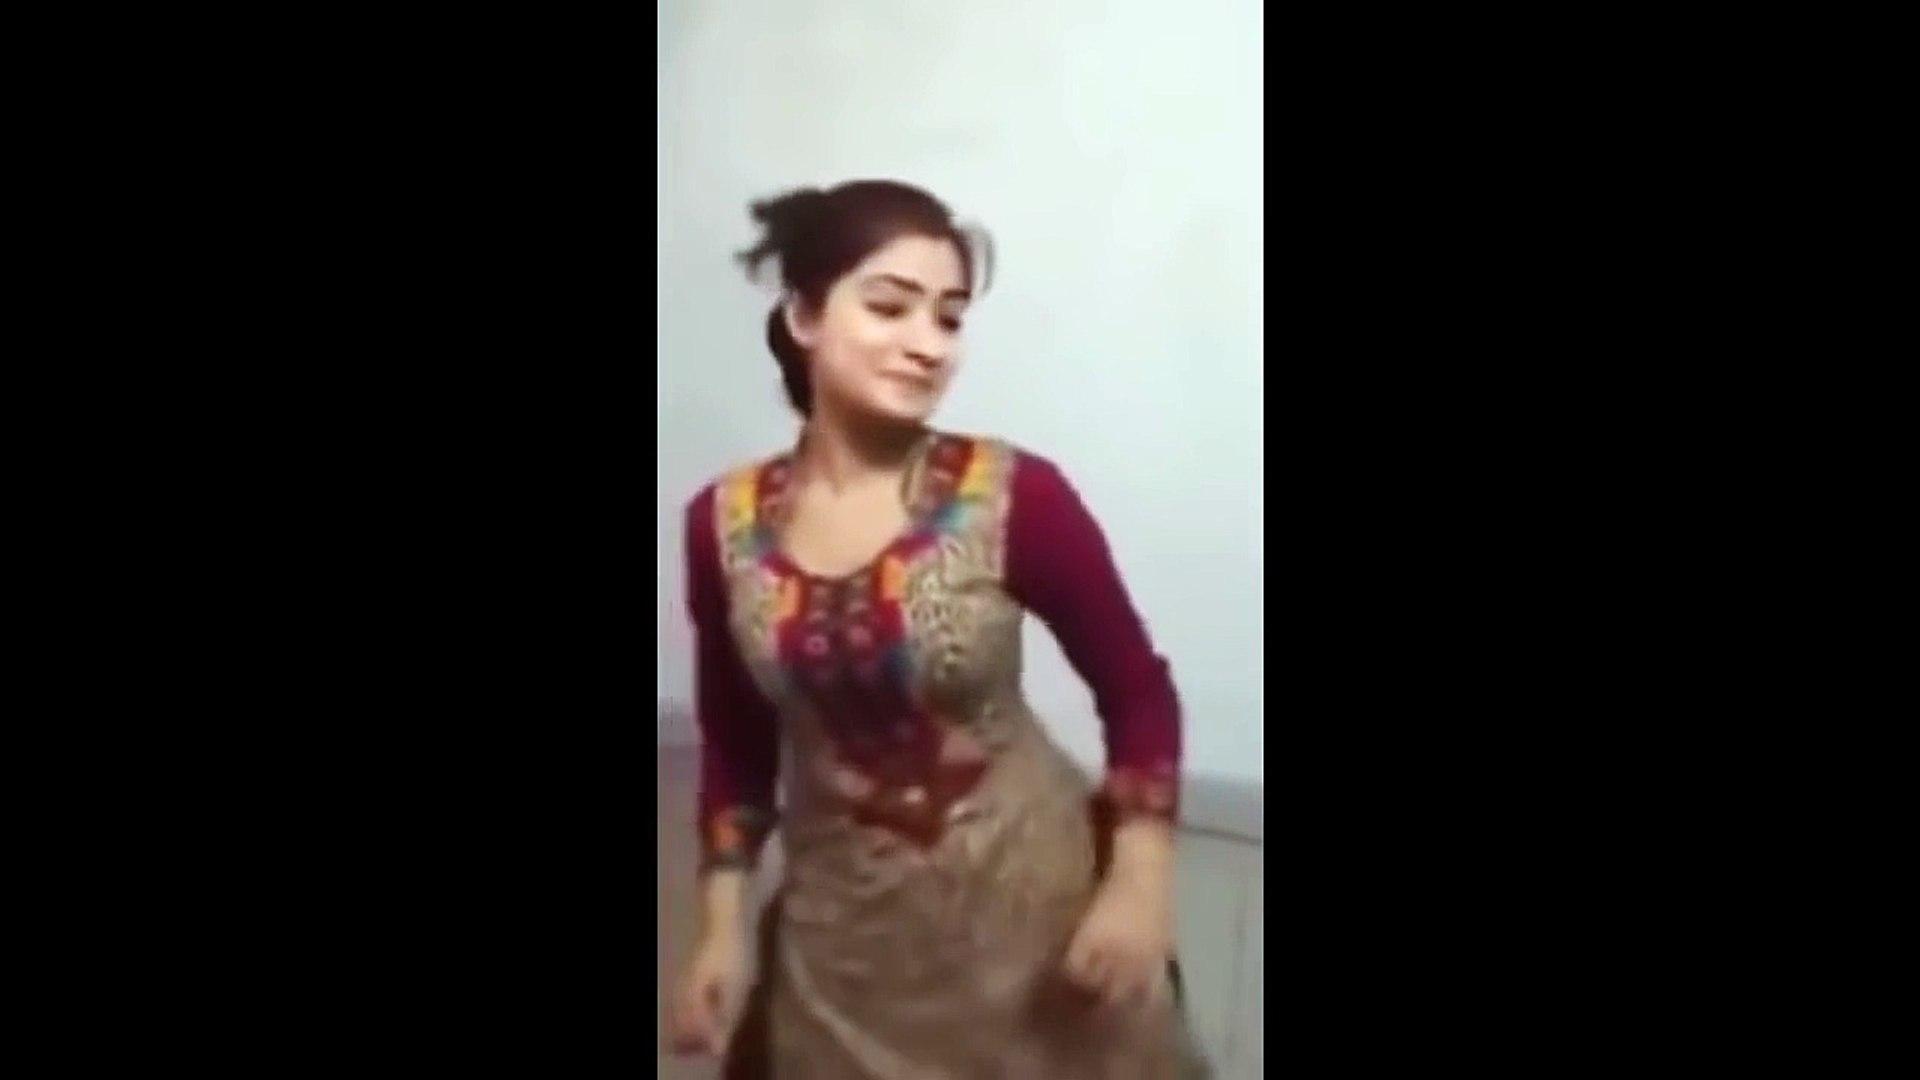 Girl Dancing Alone In Home | Trending News India | Girls Dances | Trending Videos India CCTV/ Mobile